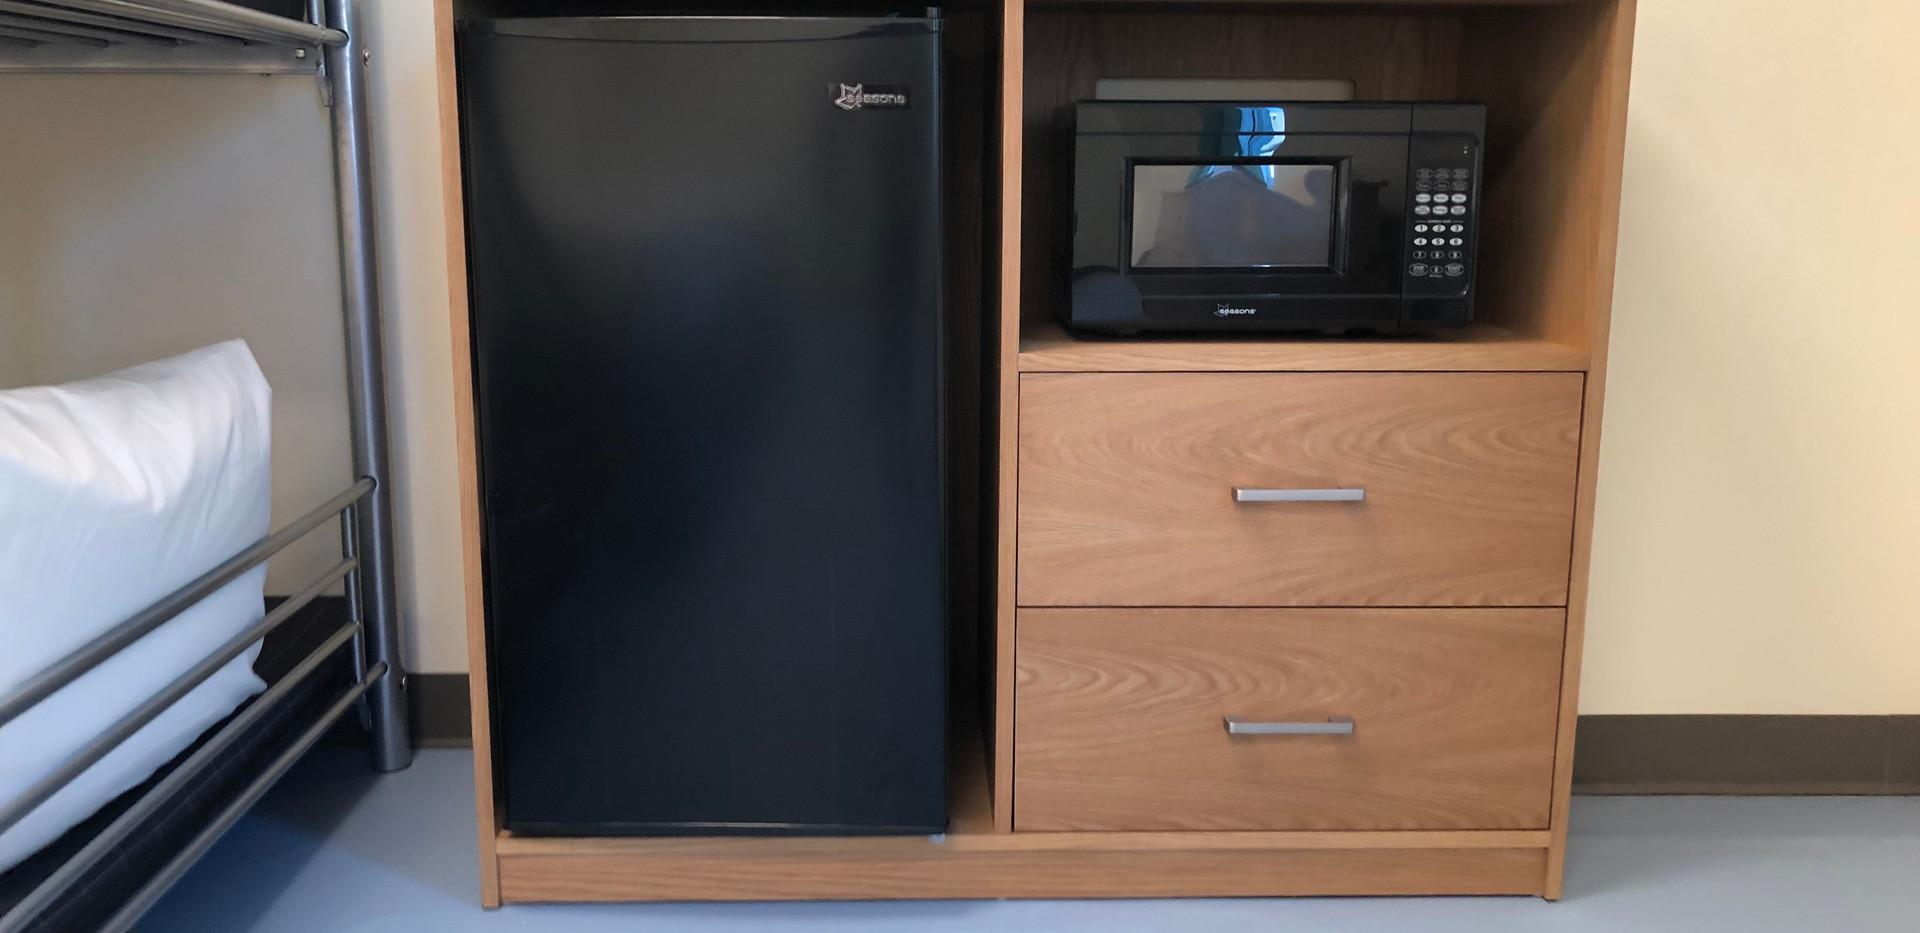 Microwave and Mini-Fridge